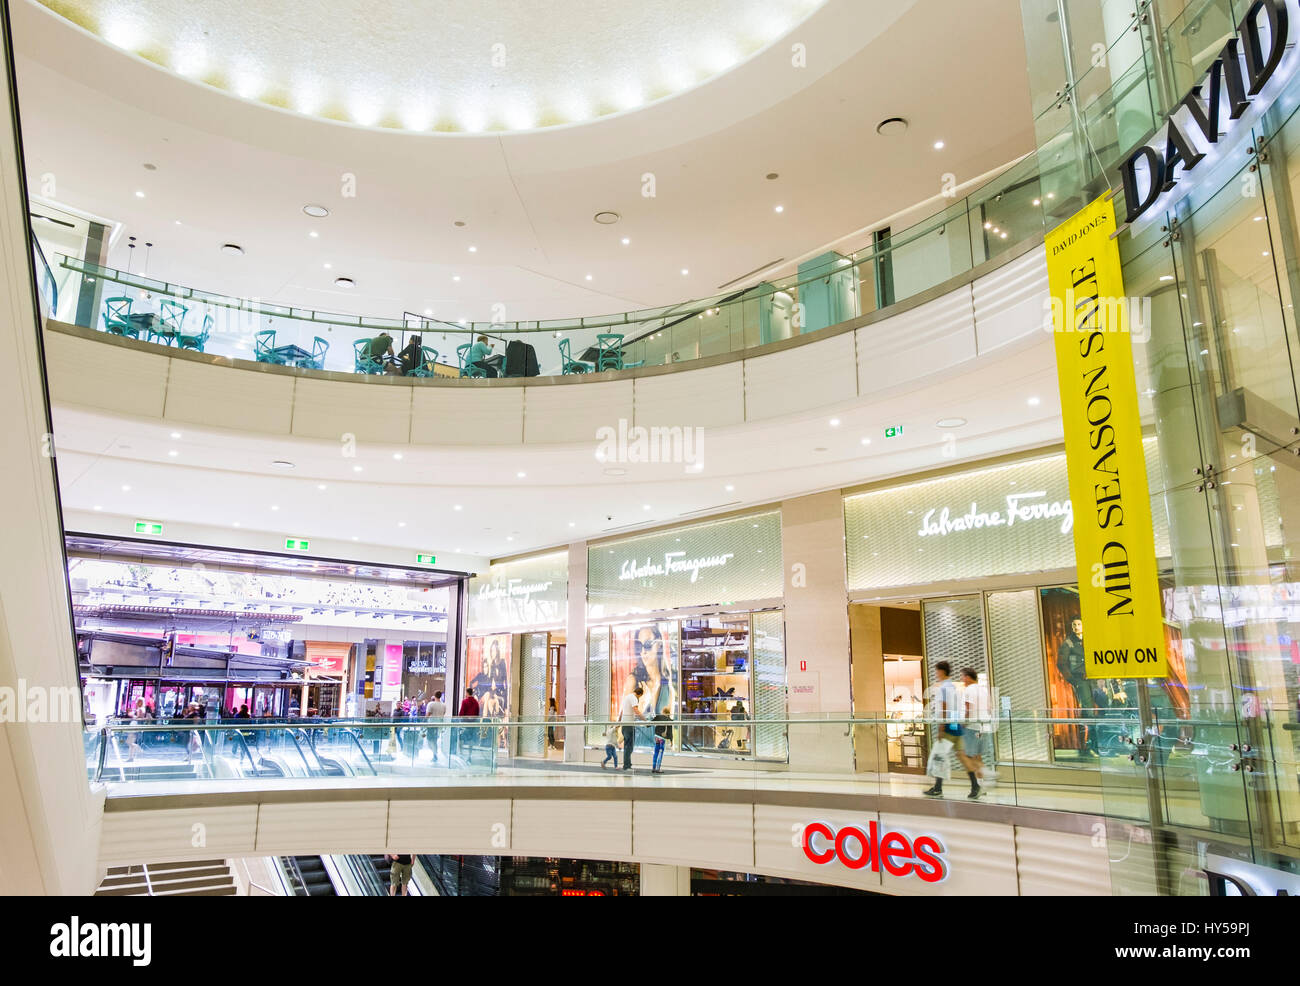 Interior of a modern shopping mall: Queen's Plaza Shopping Centre, Queen Street Mall, Brisbane, Queensland, - Stock Image